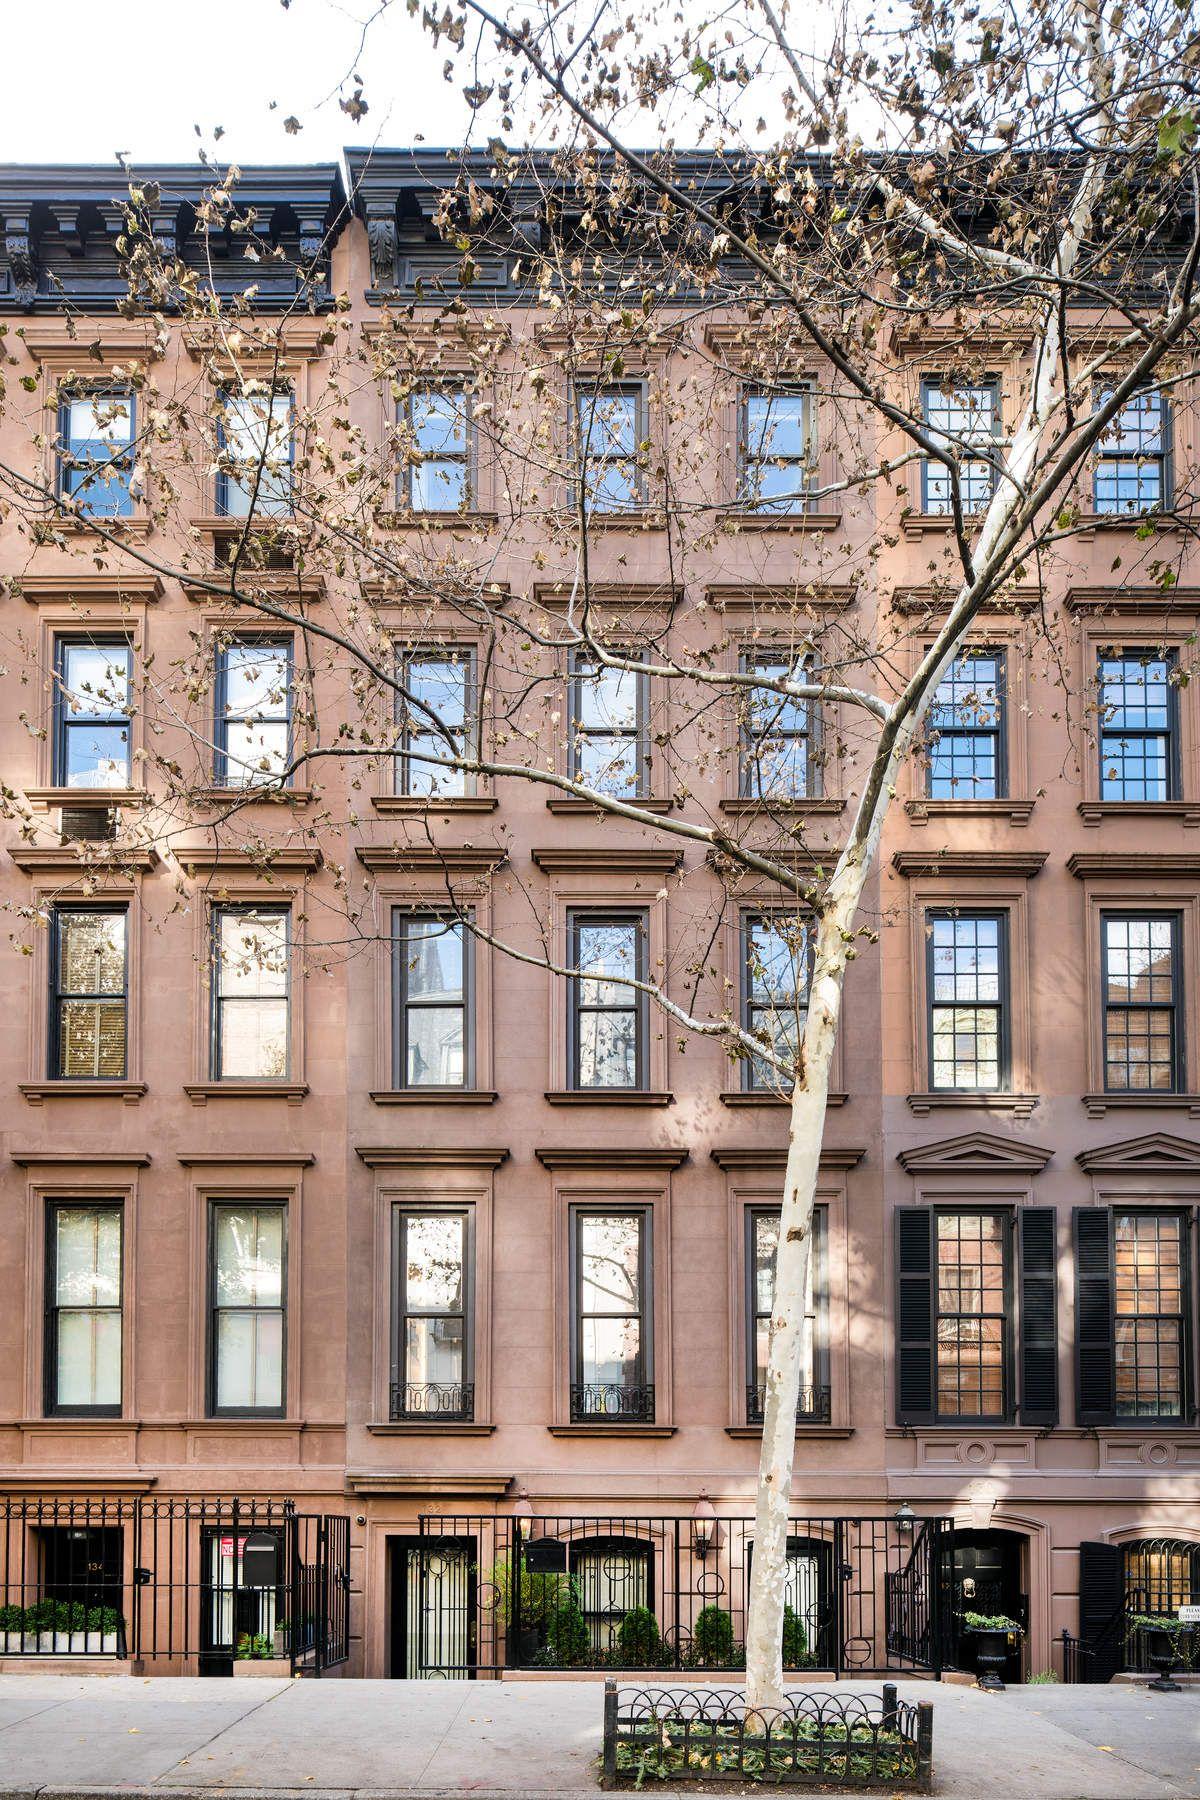 Таунхаус для того Продажа на 132 East 62nd Street Upper East Side, New York, Нью-Йорк, 10065 Соединенные Штаты